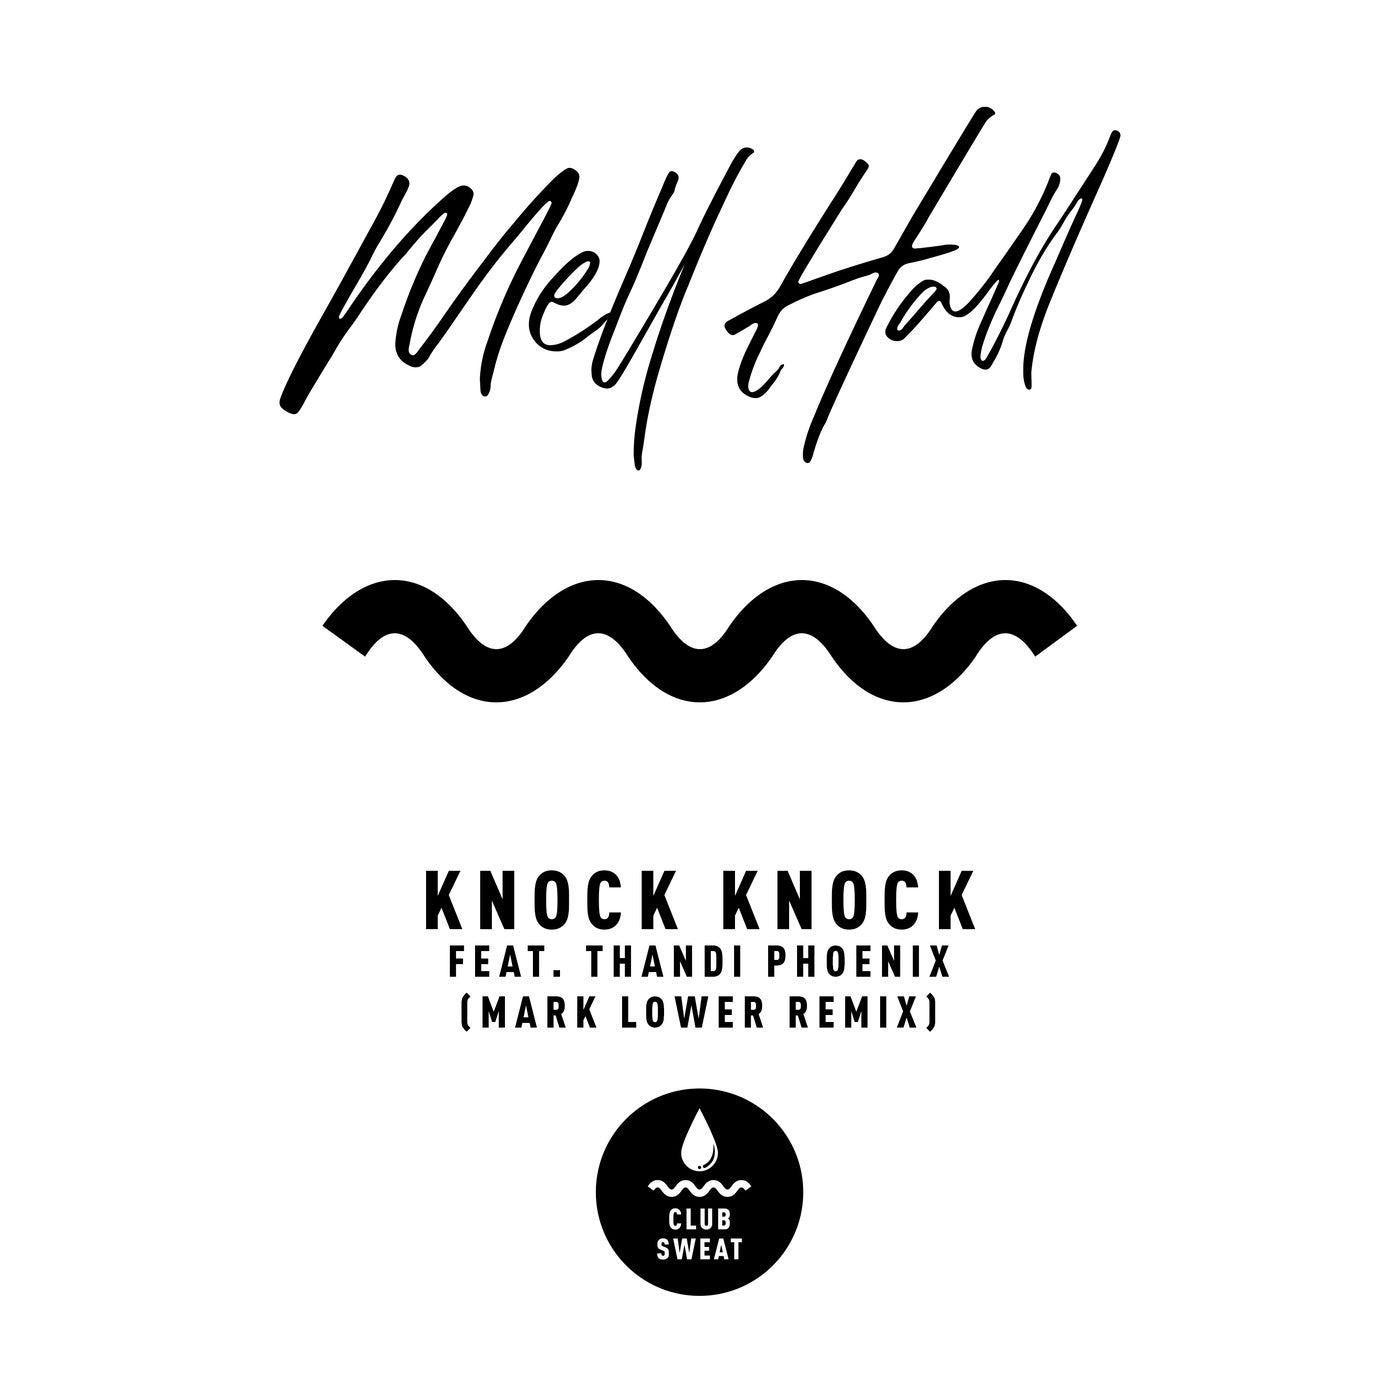 Knock Knock feat. Thandi Phoenix (Mark Lower Extended Mix)